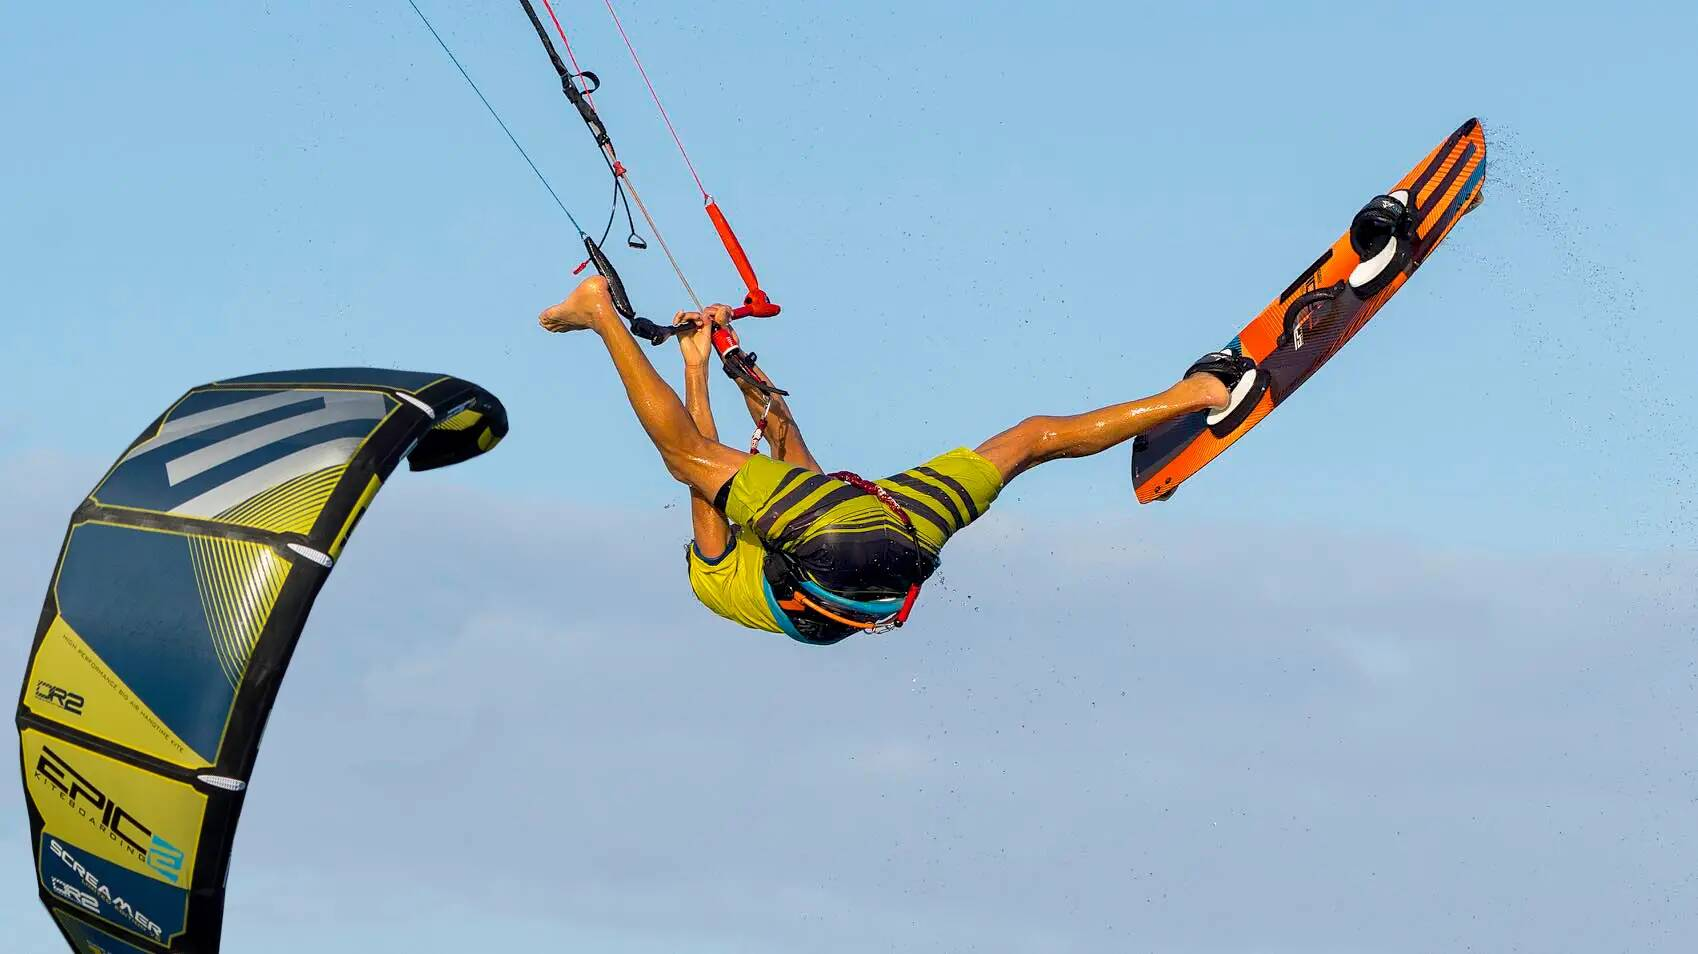 Kitesurfing Work Out - with Epic Kites Kiteboarding